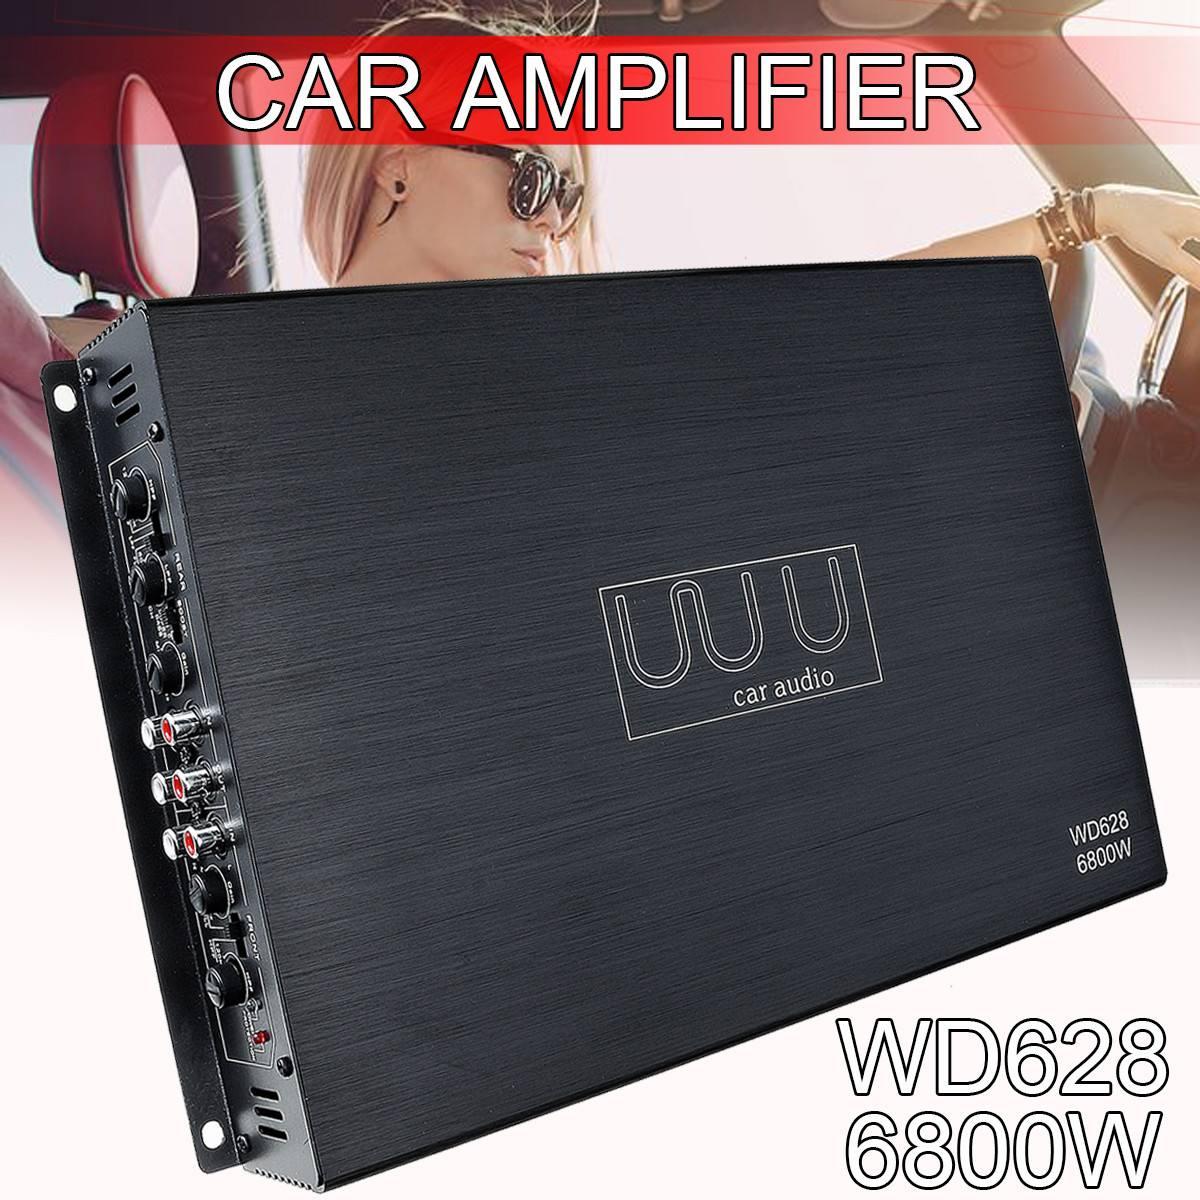 DC 12V 6800 Watt 4 Channel Car font b Amplifier b font Audio Stereo Bass Speaker